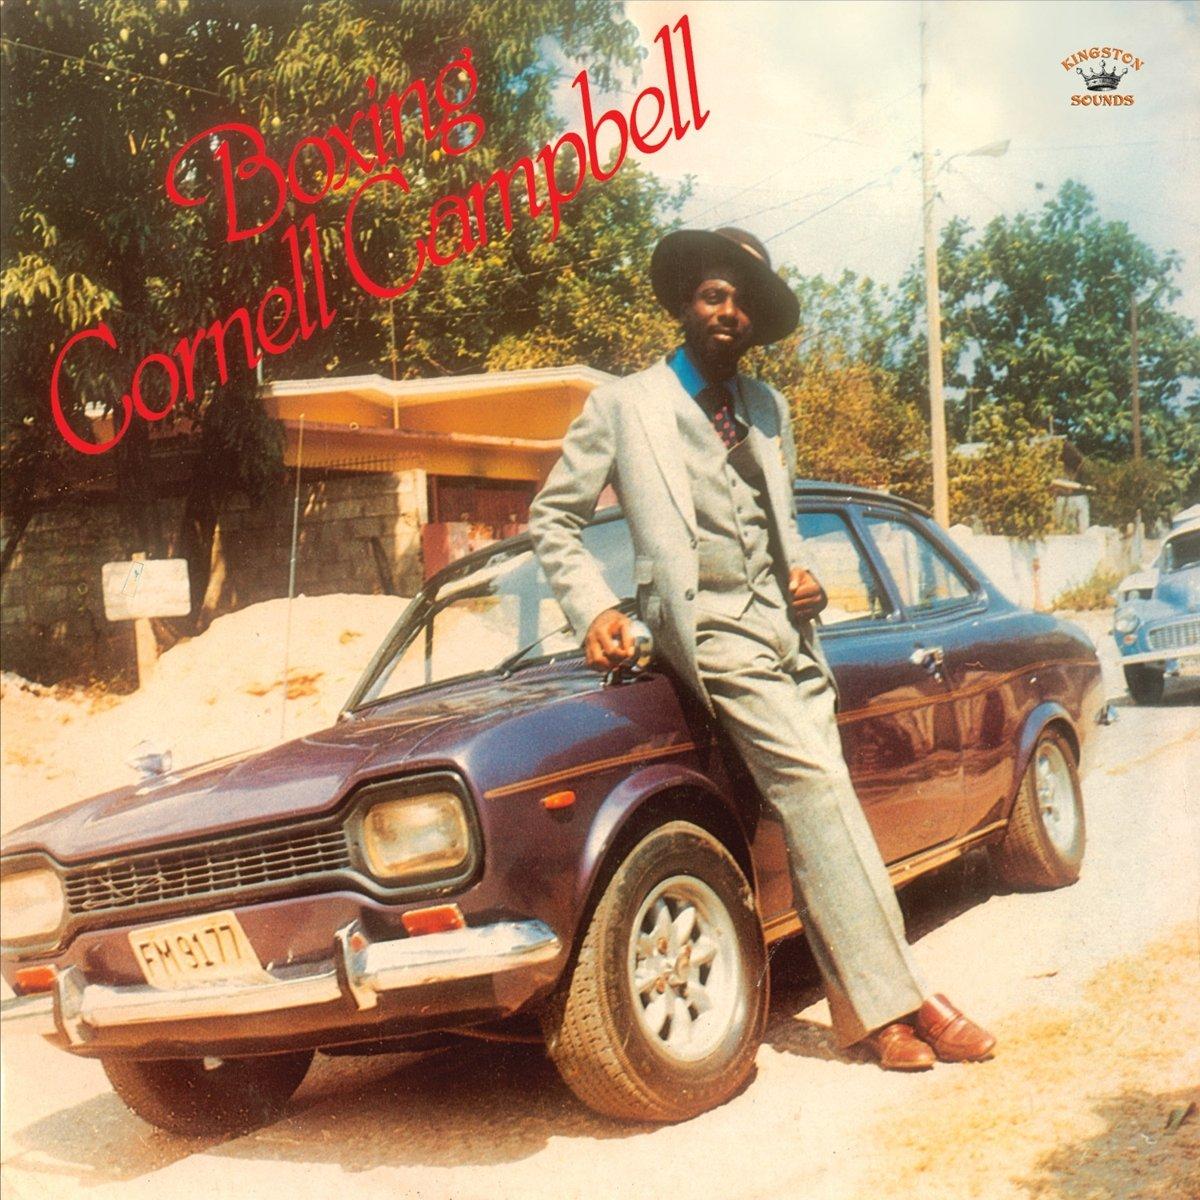 "Más discos, por favor (aka Los Antiguos 1001). ""Africa/Brass"" (John Coltrane), ""Afro-cuban jazz suite"" (Machito & Charlie Parker), ""Afterglow"" (Afterglow) - Página 2 81eRRU1vYYL._SL1200_"